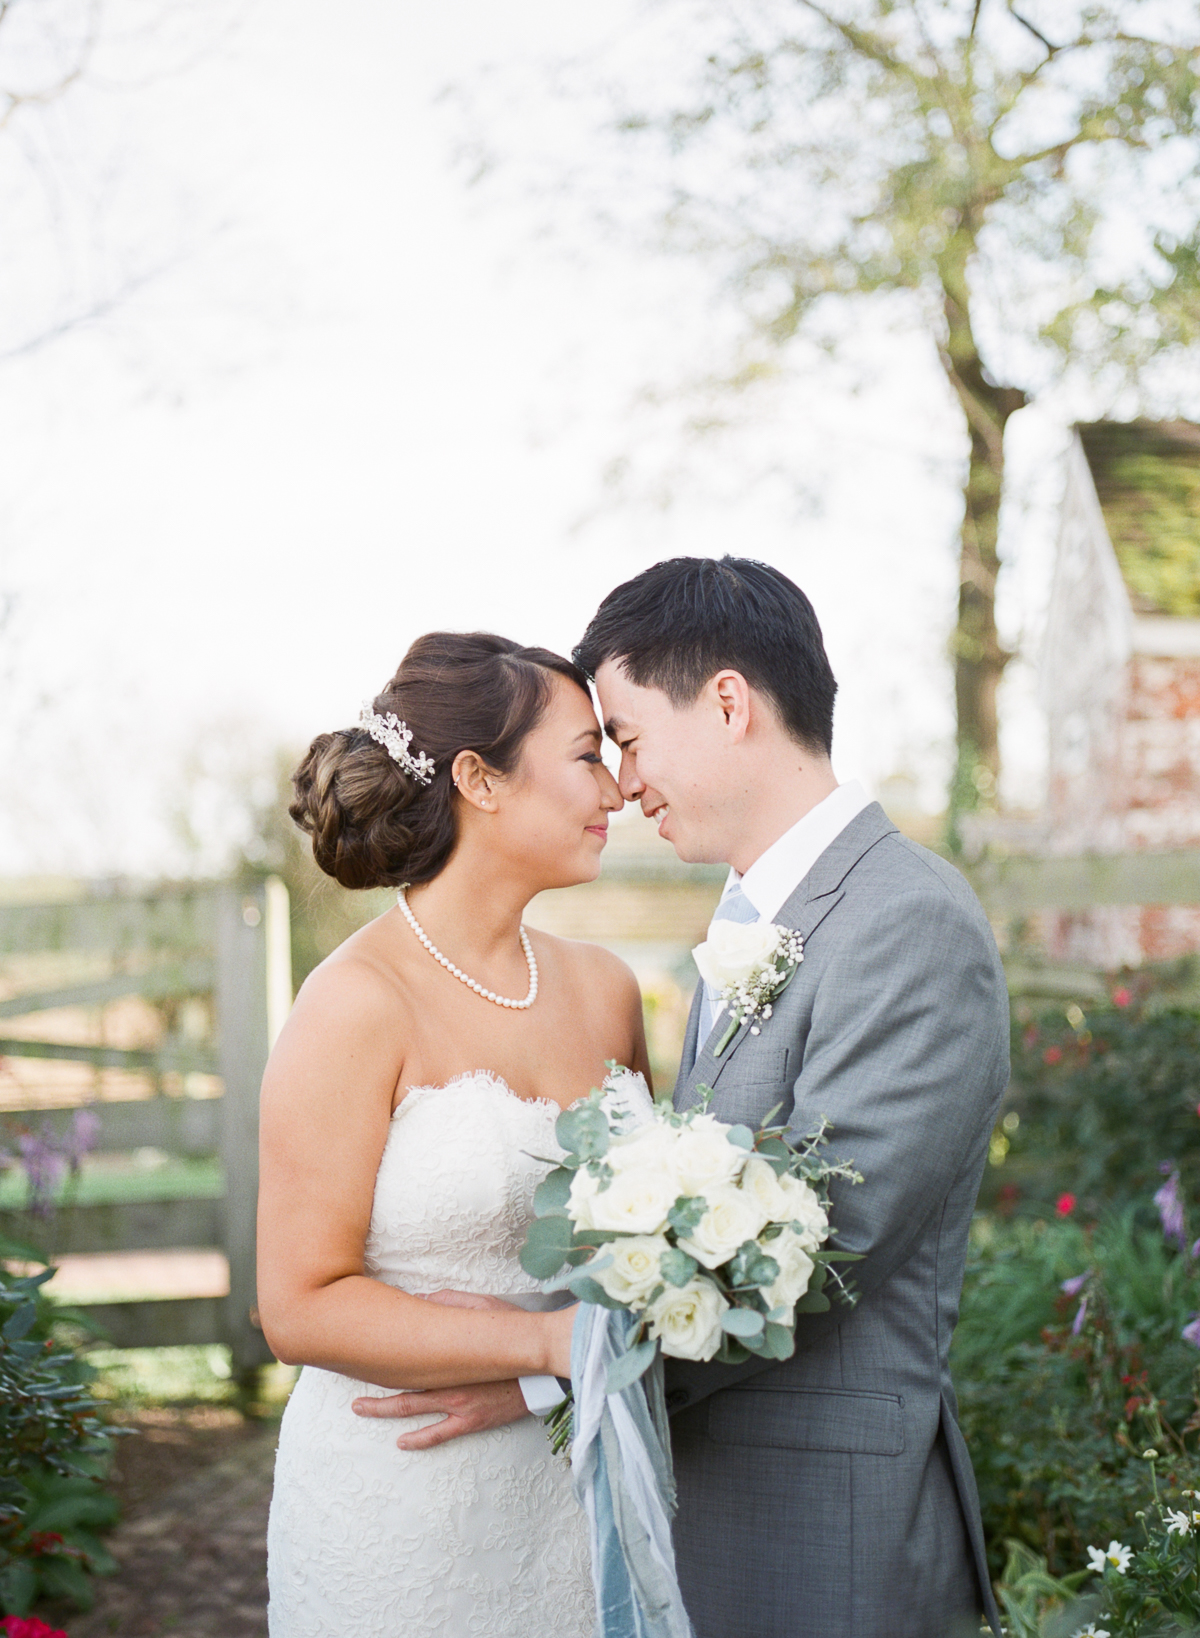 MD-Walkers-Overlook-Wedding-Bride-Get-Ready-88.jpg